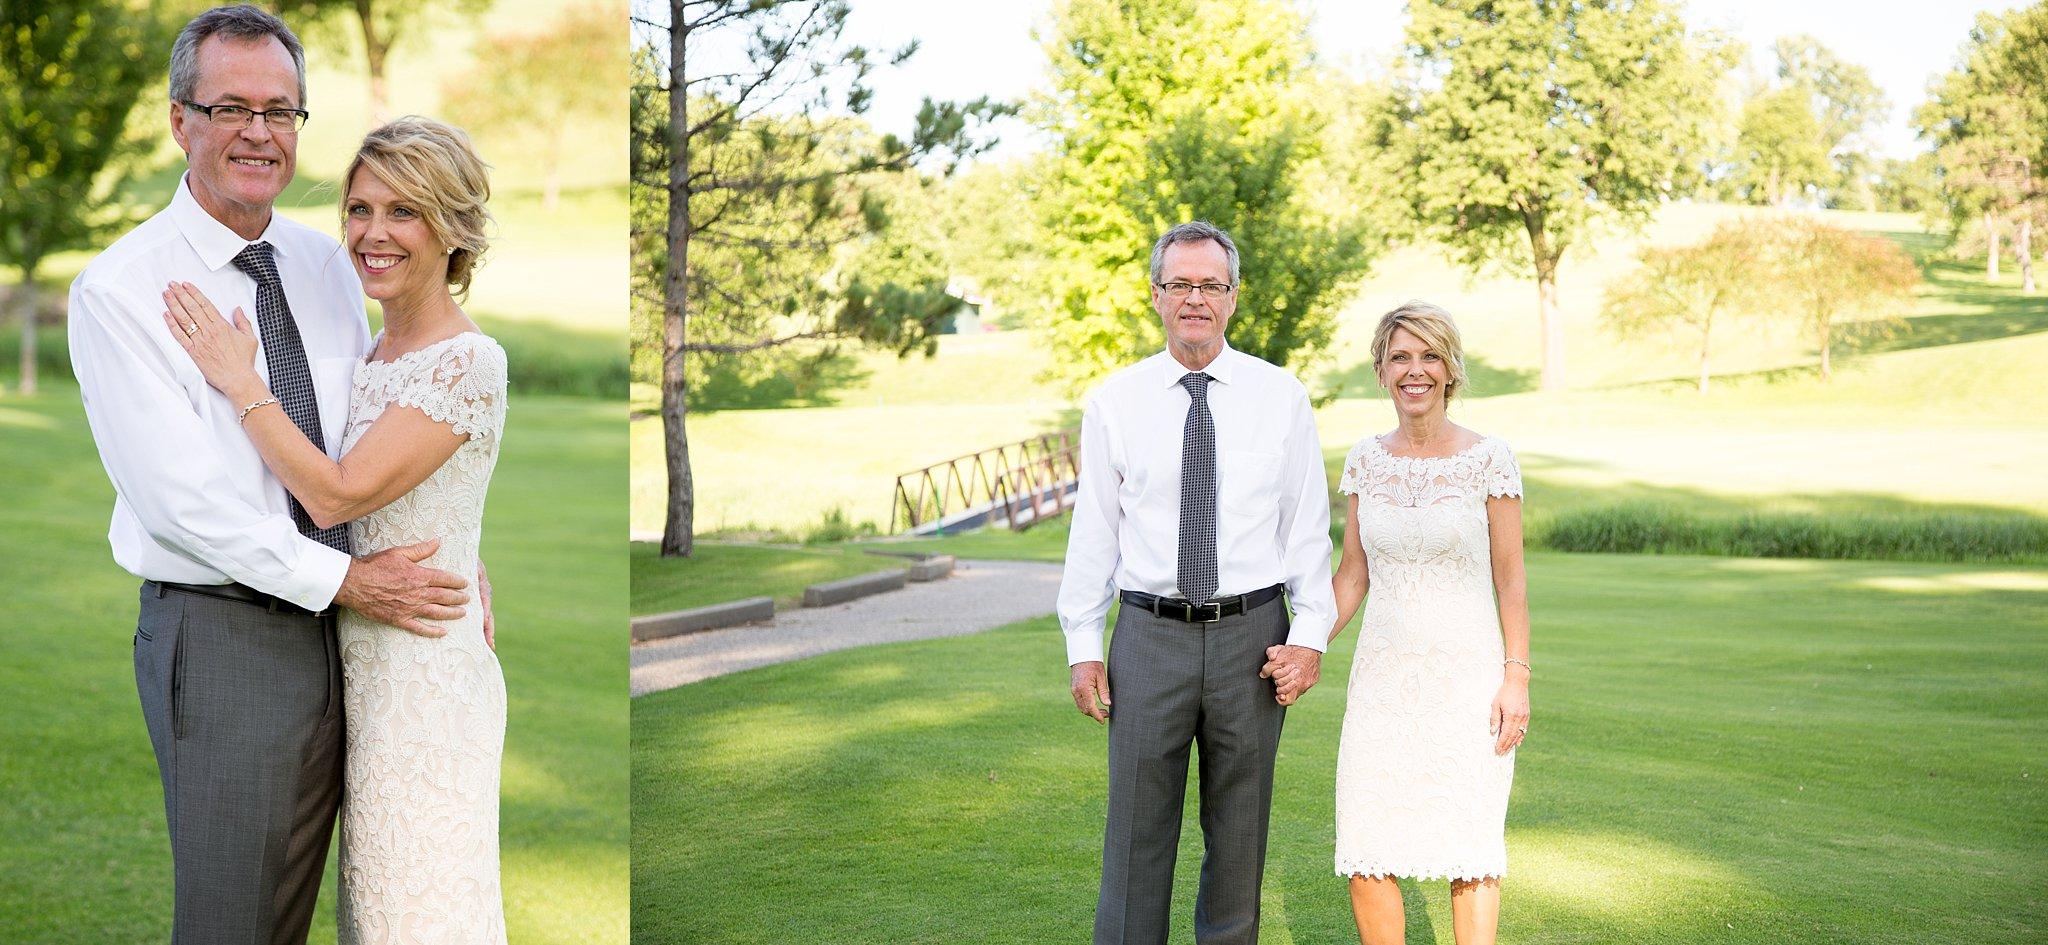 11Alice Hq Photography   Gary + Karen Le Sueur Country Club Wedding.jpg